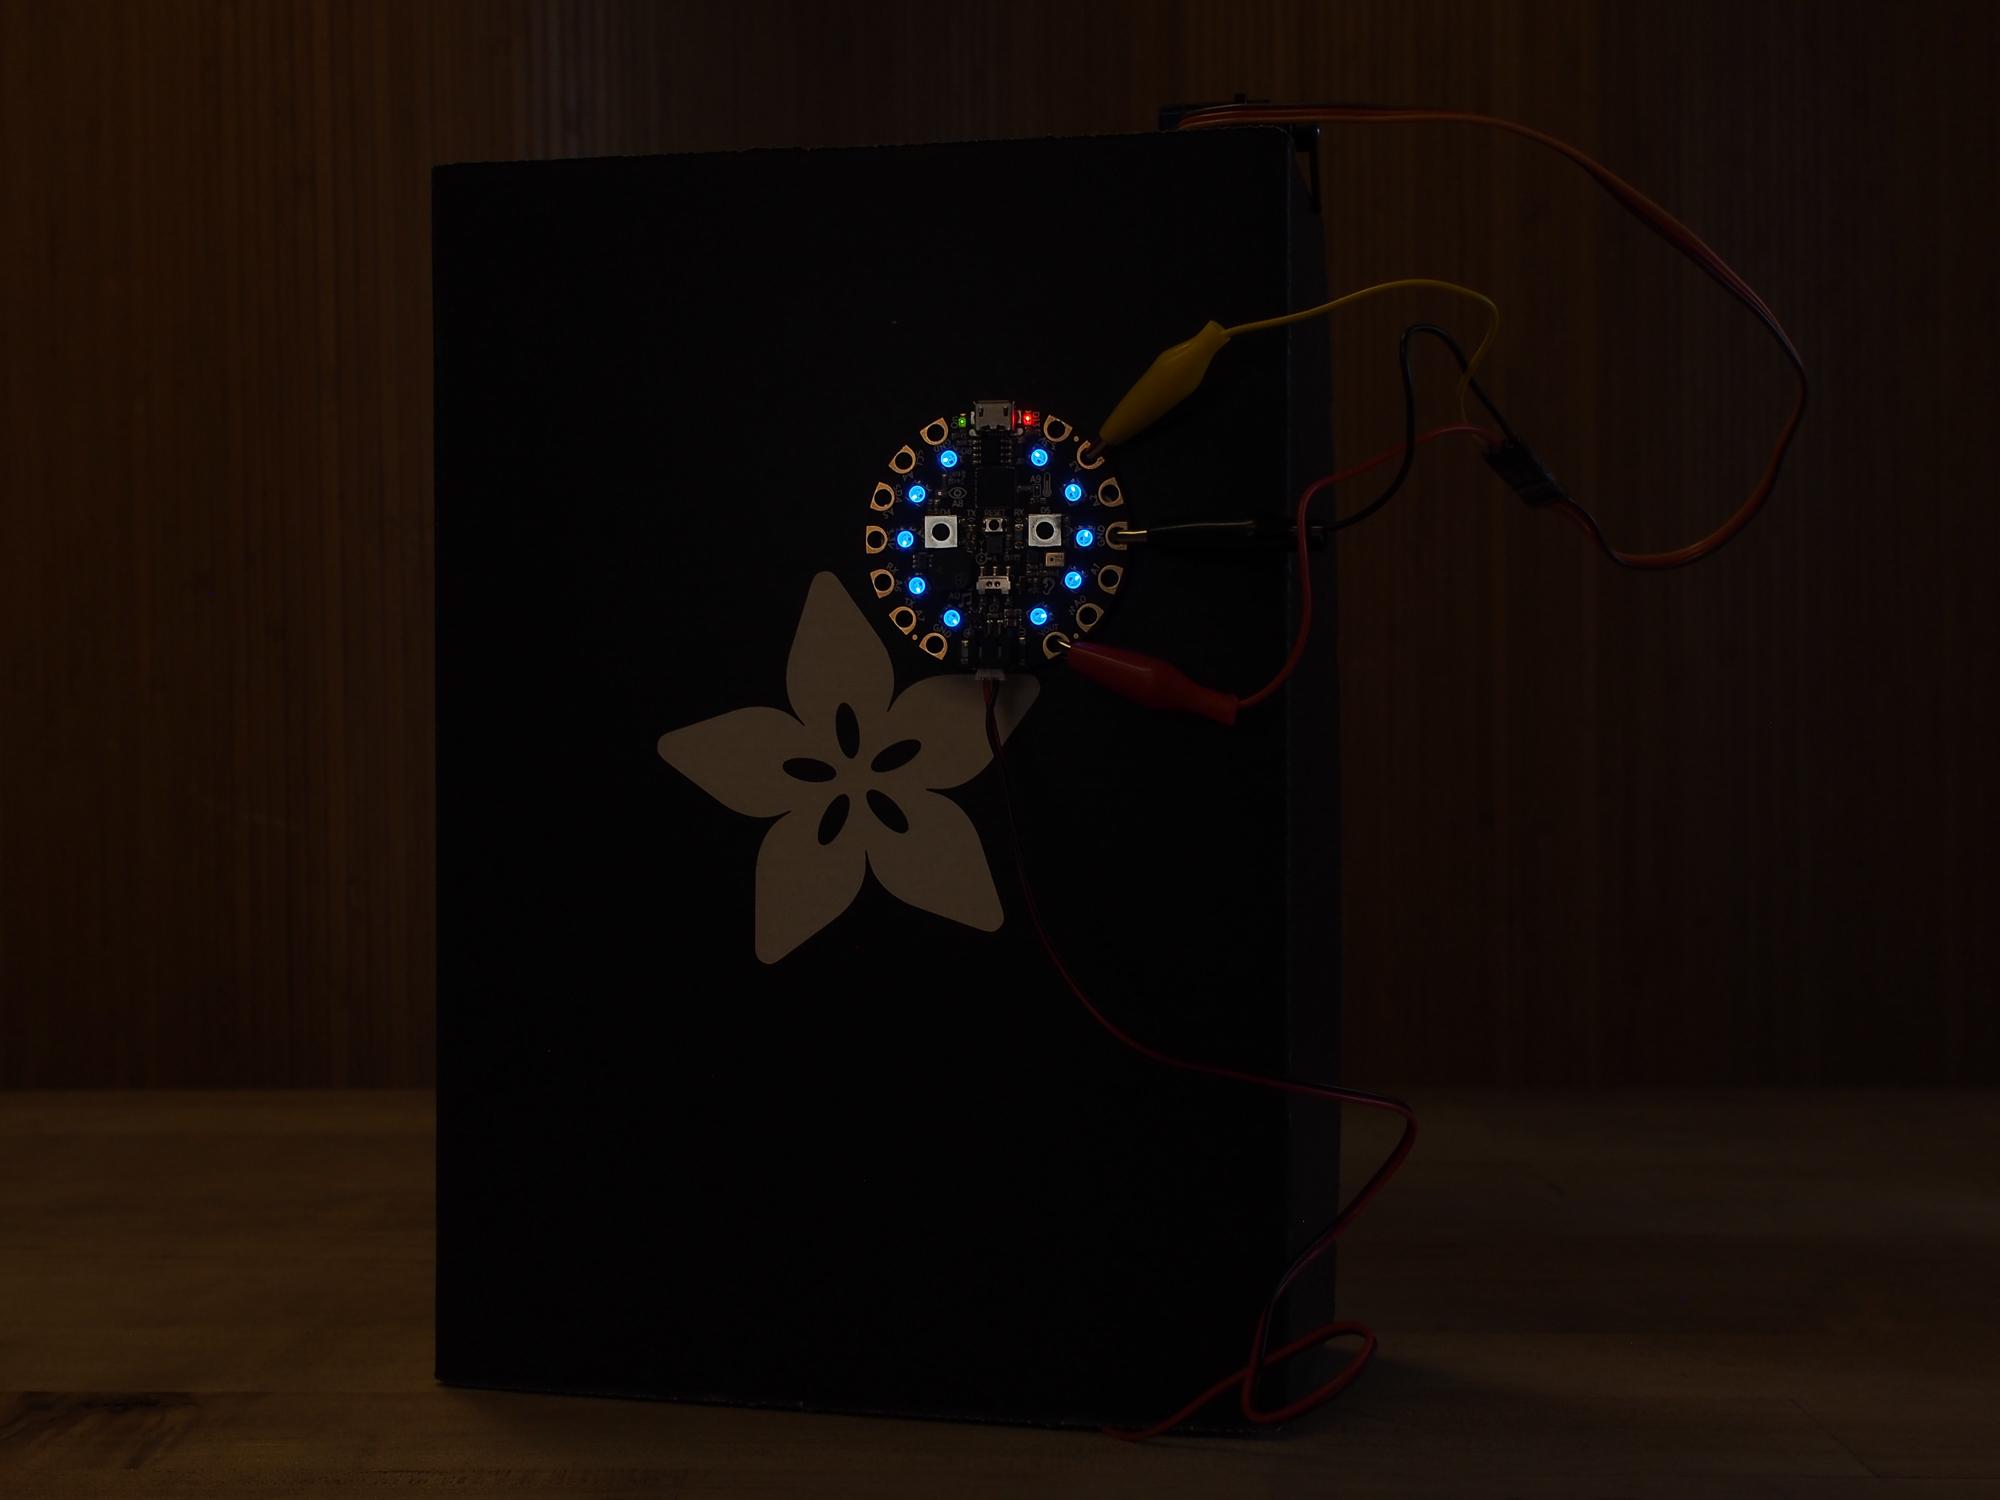 circuitpython_PC080527_2k.jpg